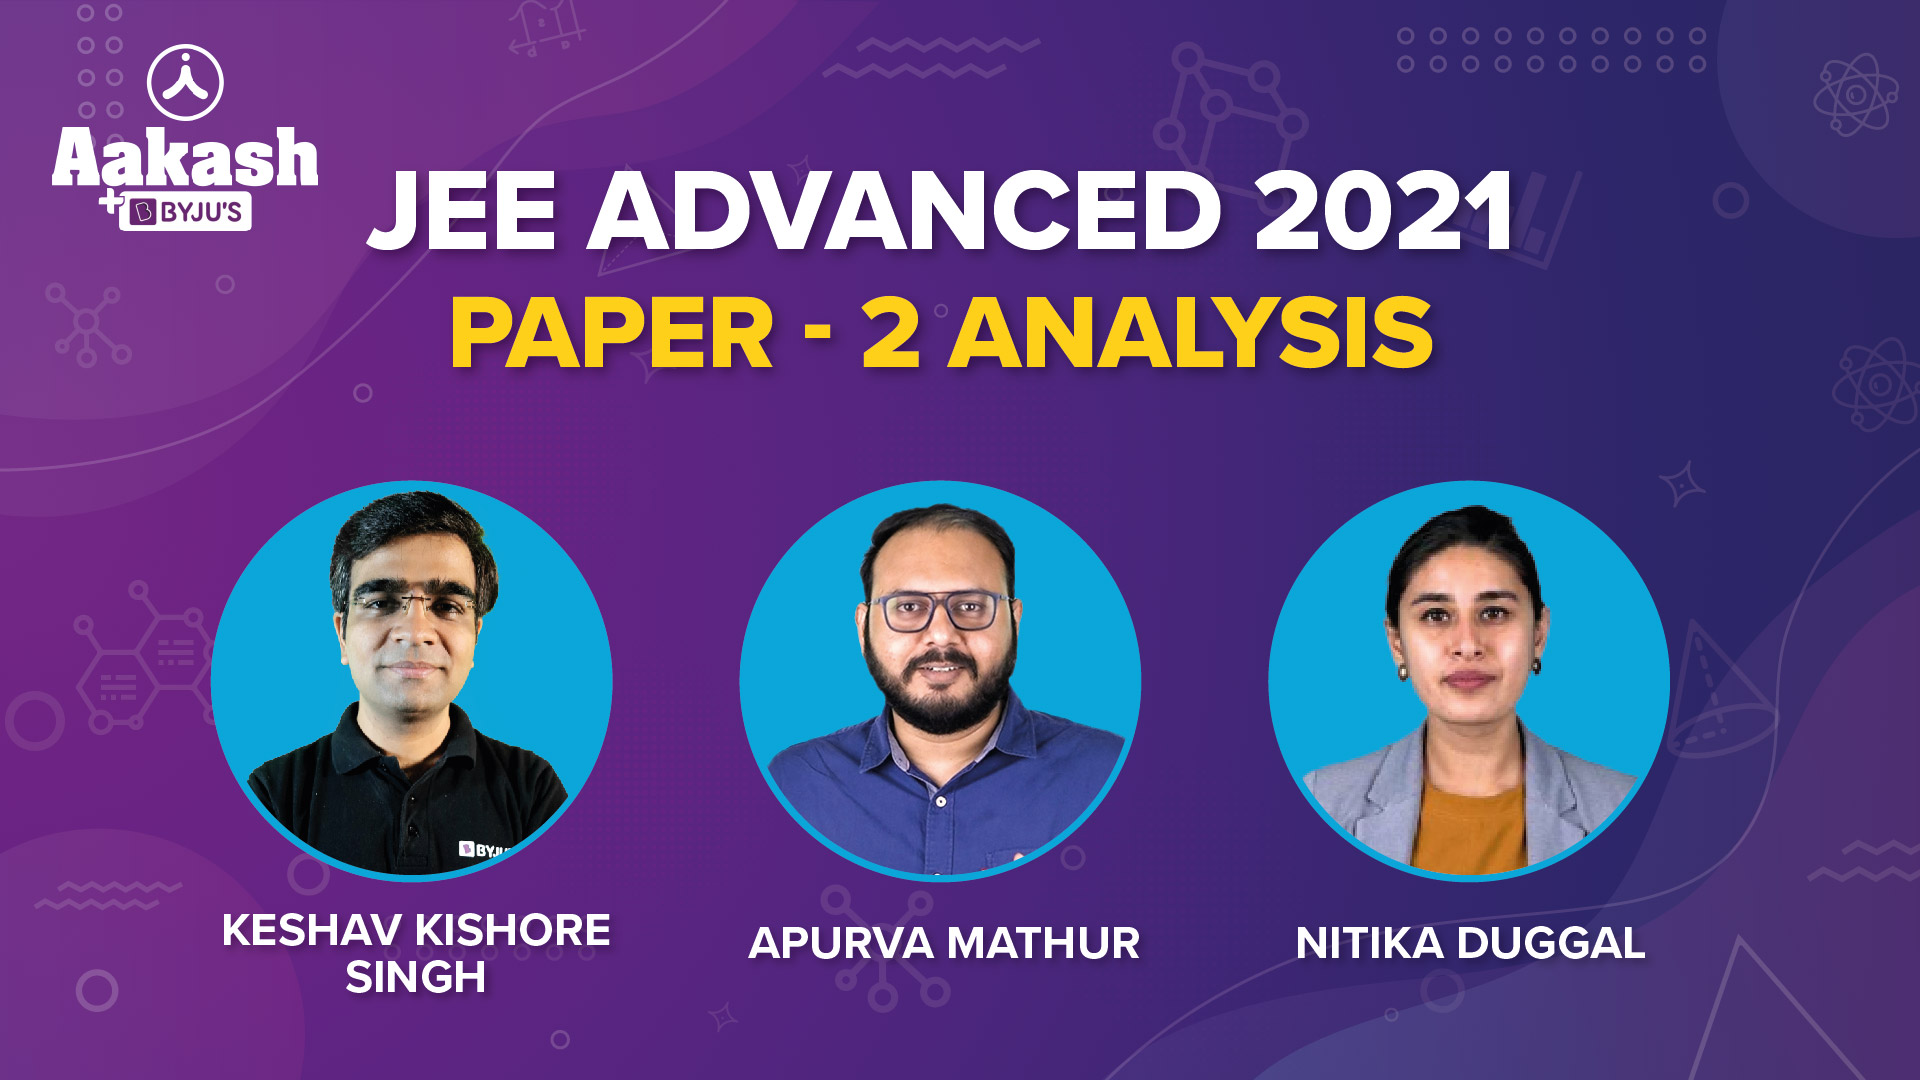 JEE Advanced 2021 Paper 2 Analysis